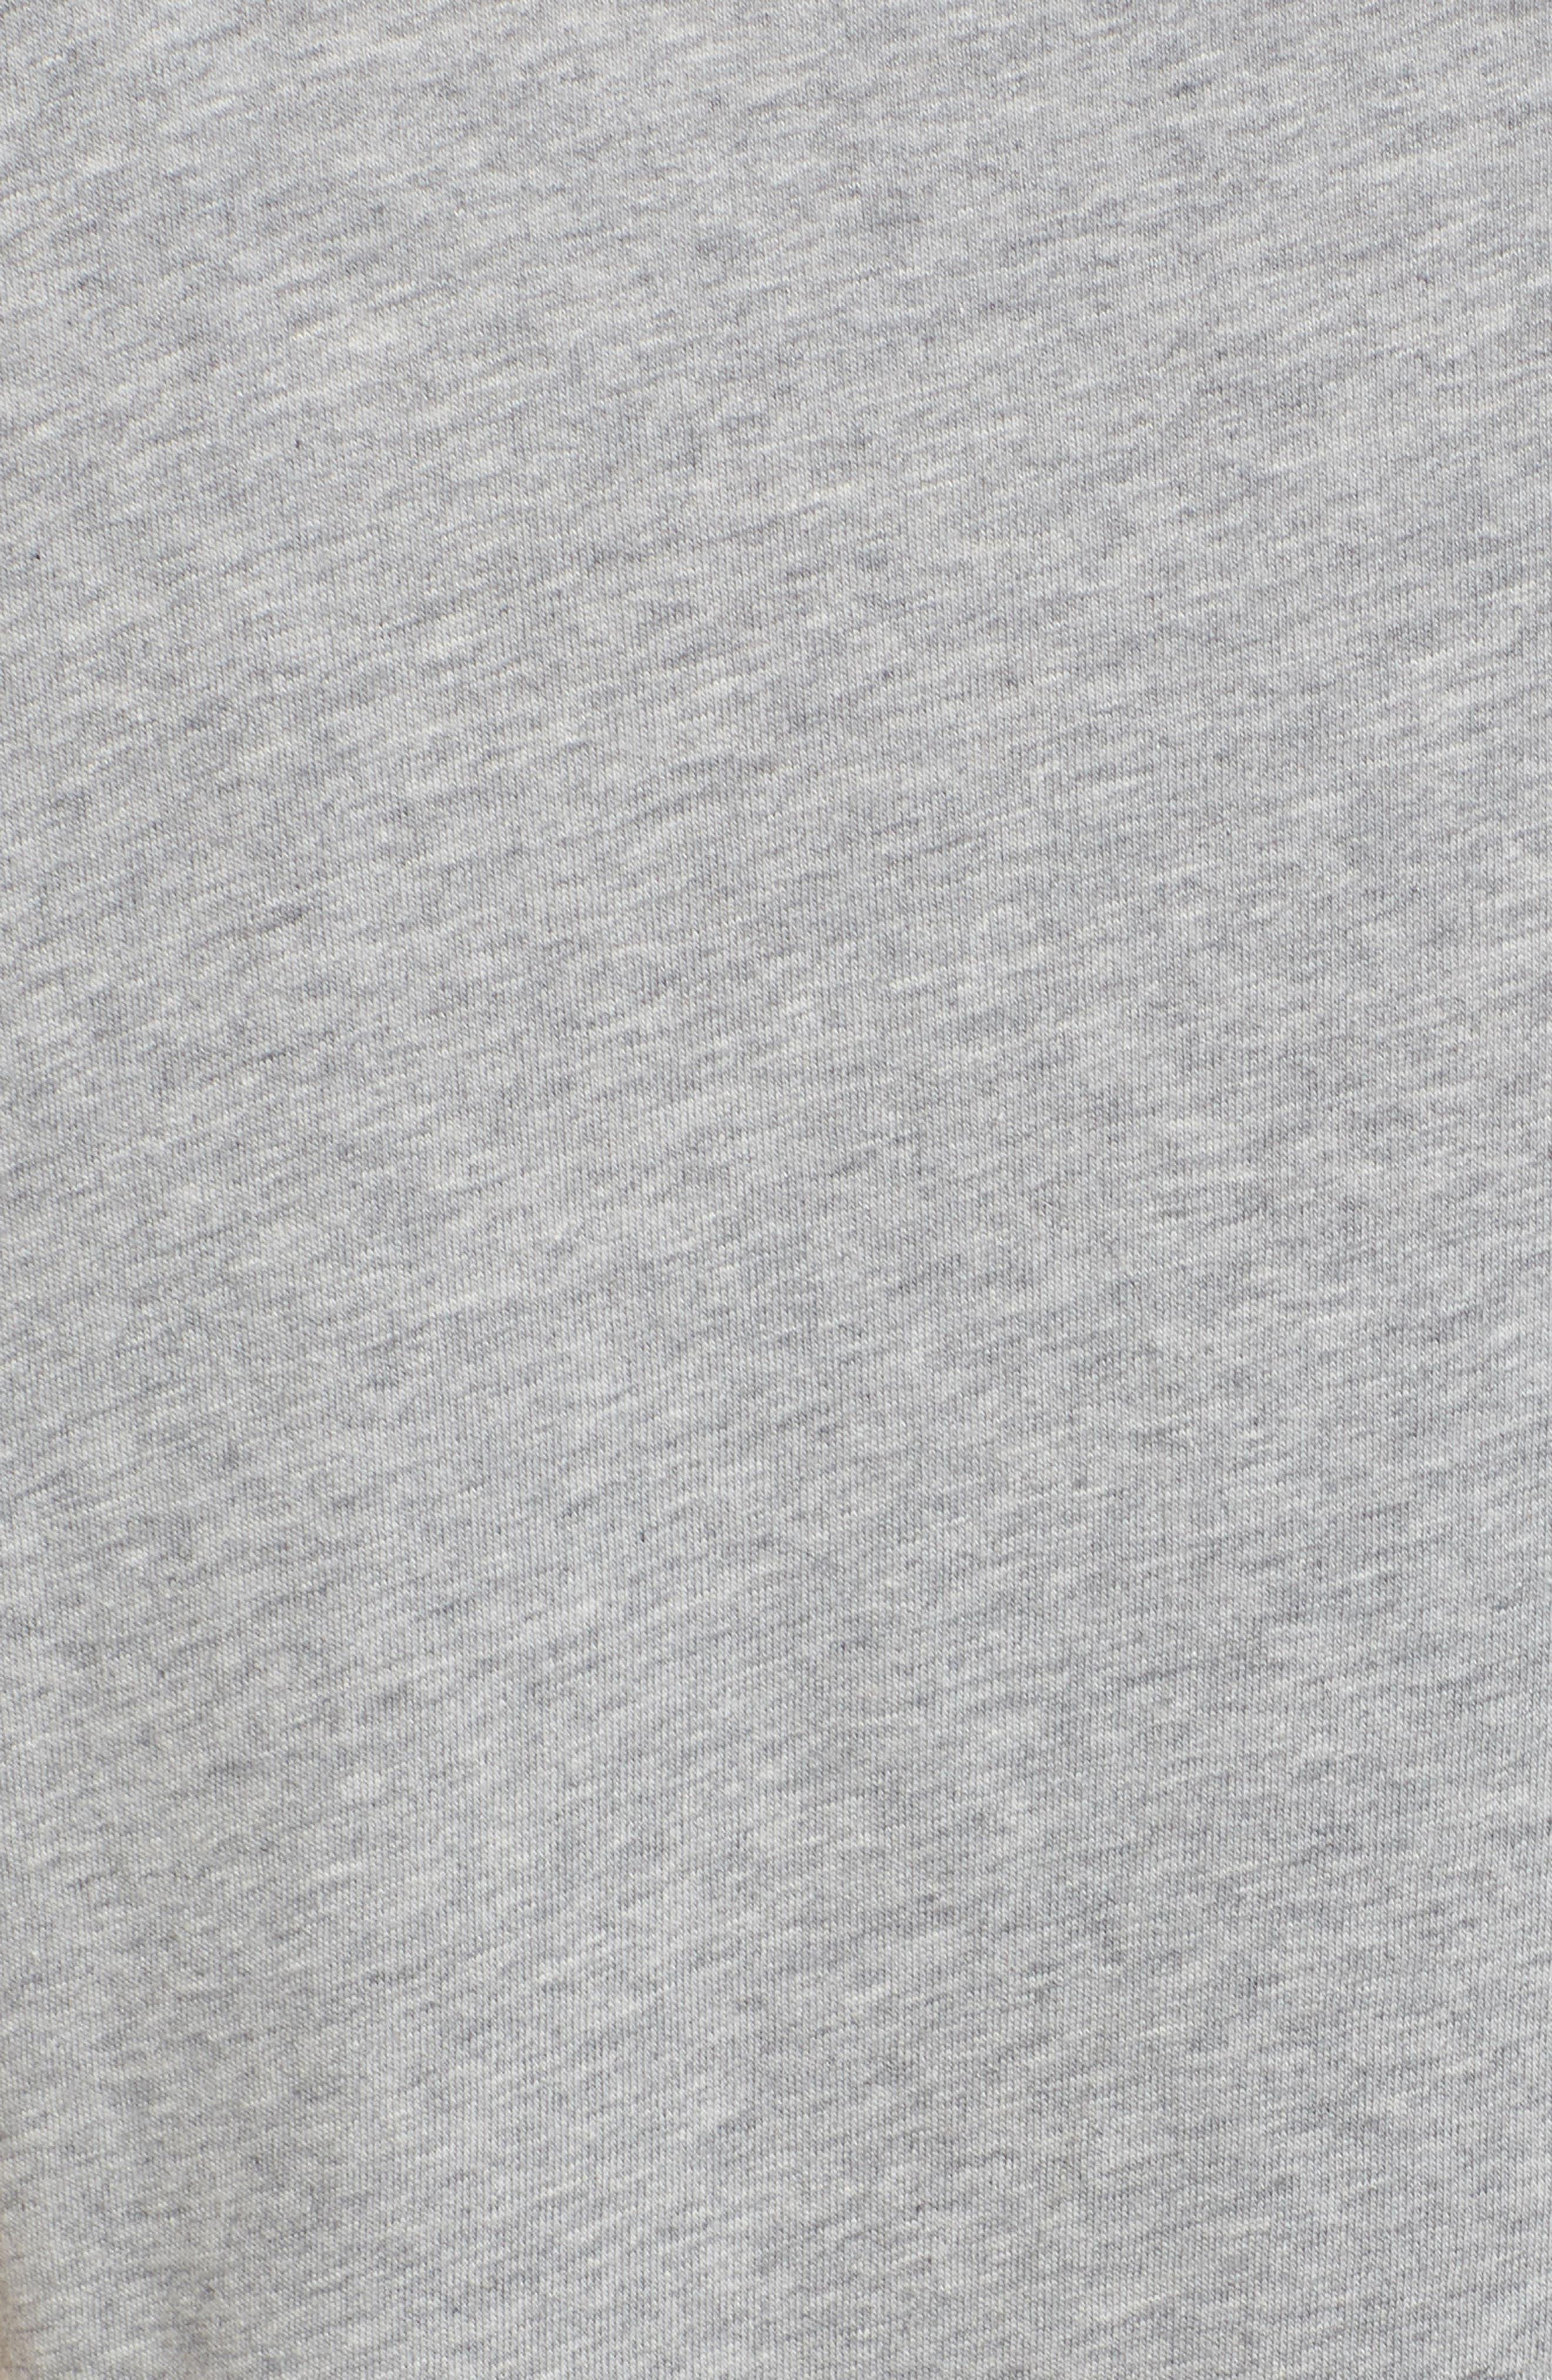 Sportswear Kiss My Airs Tee,                             Alternate thumbnail 5, color,                             Dark Grey Heather/ Wolf Grey